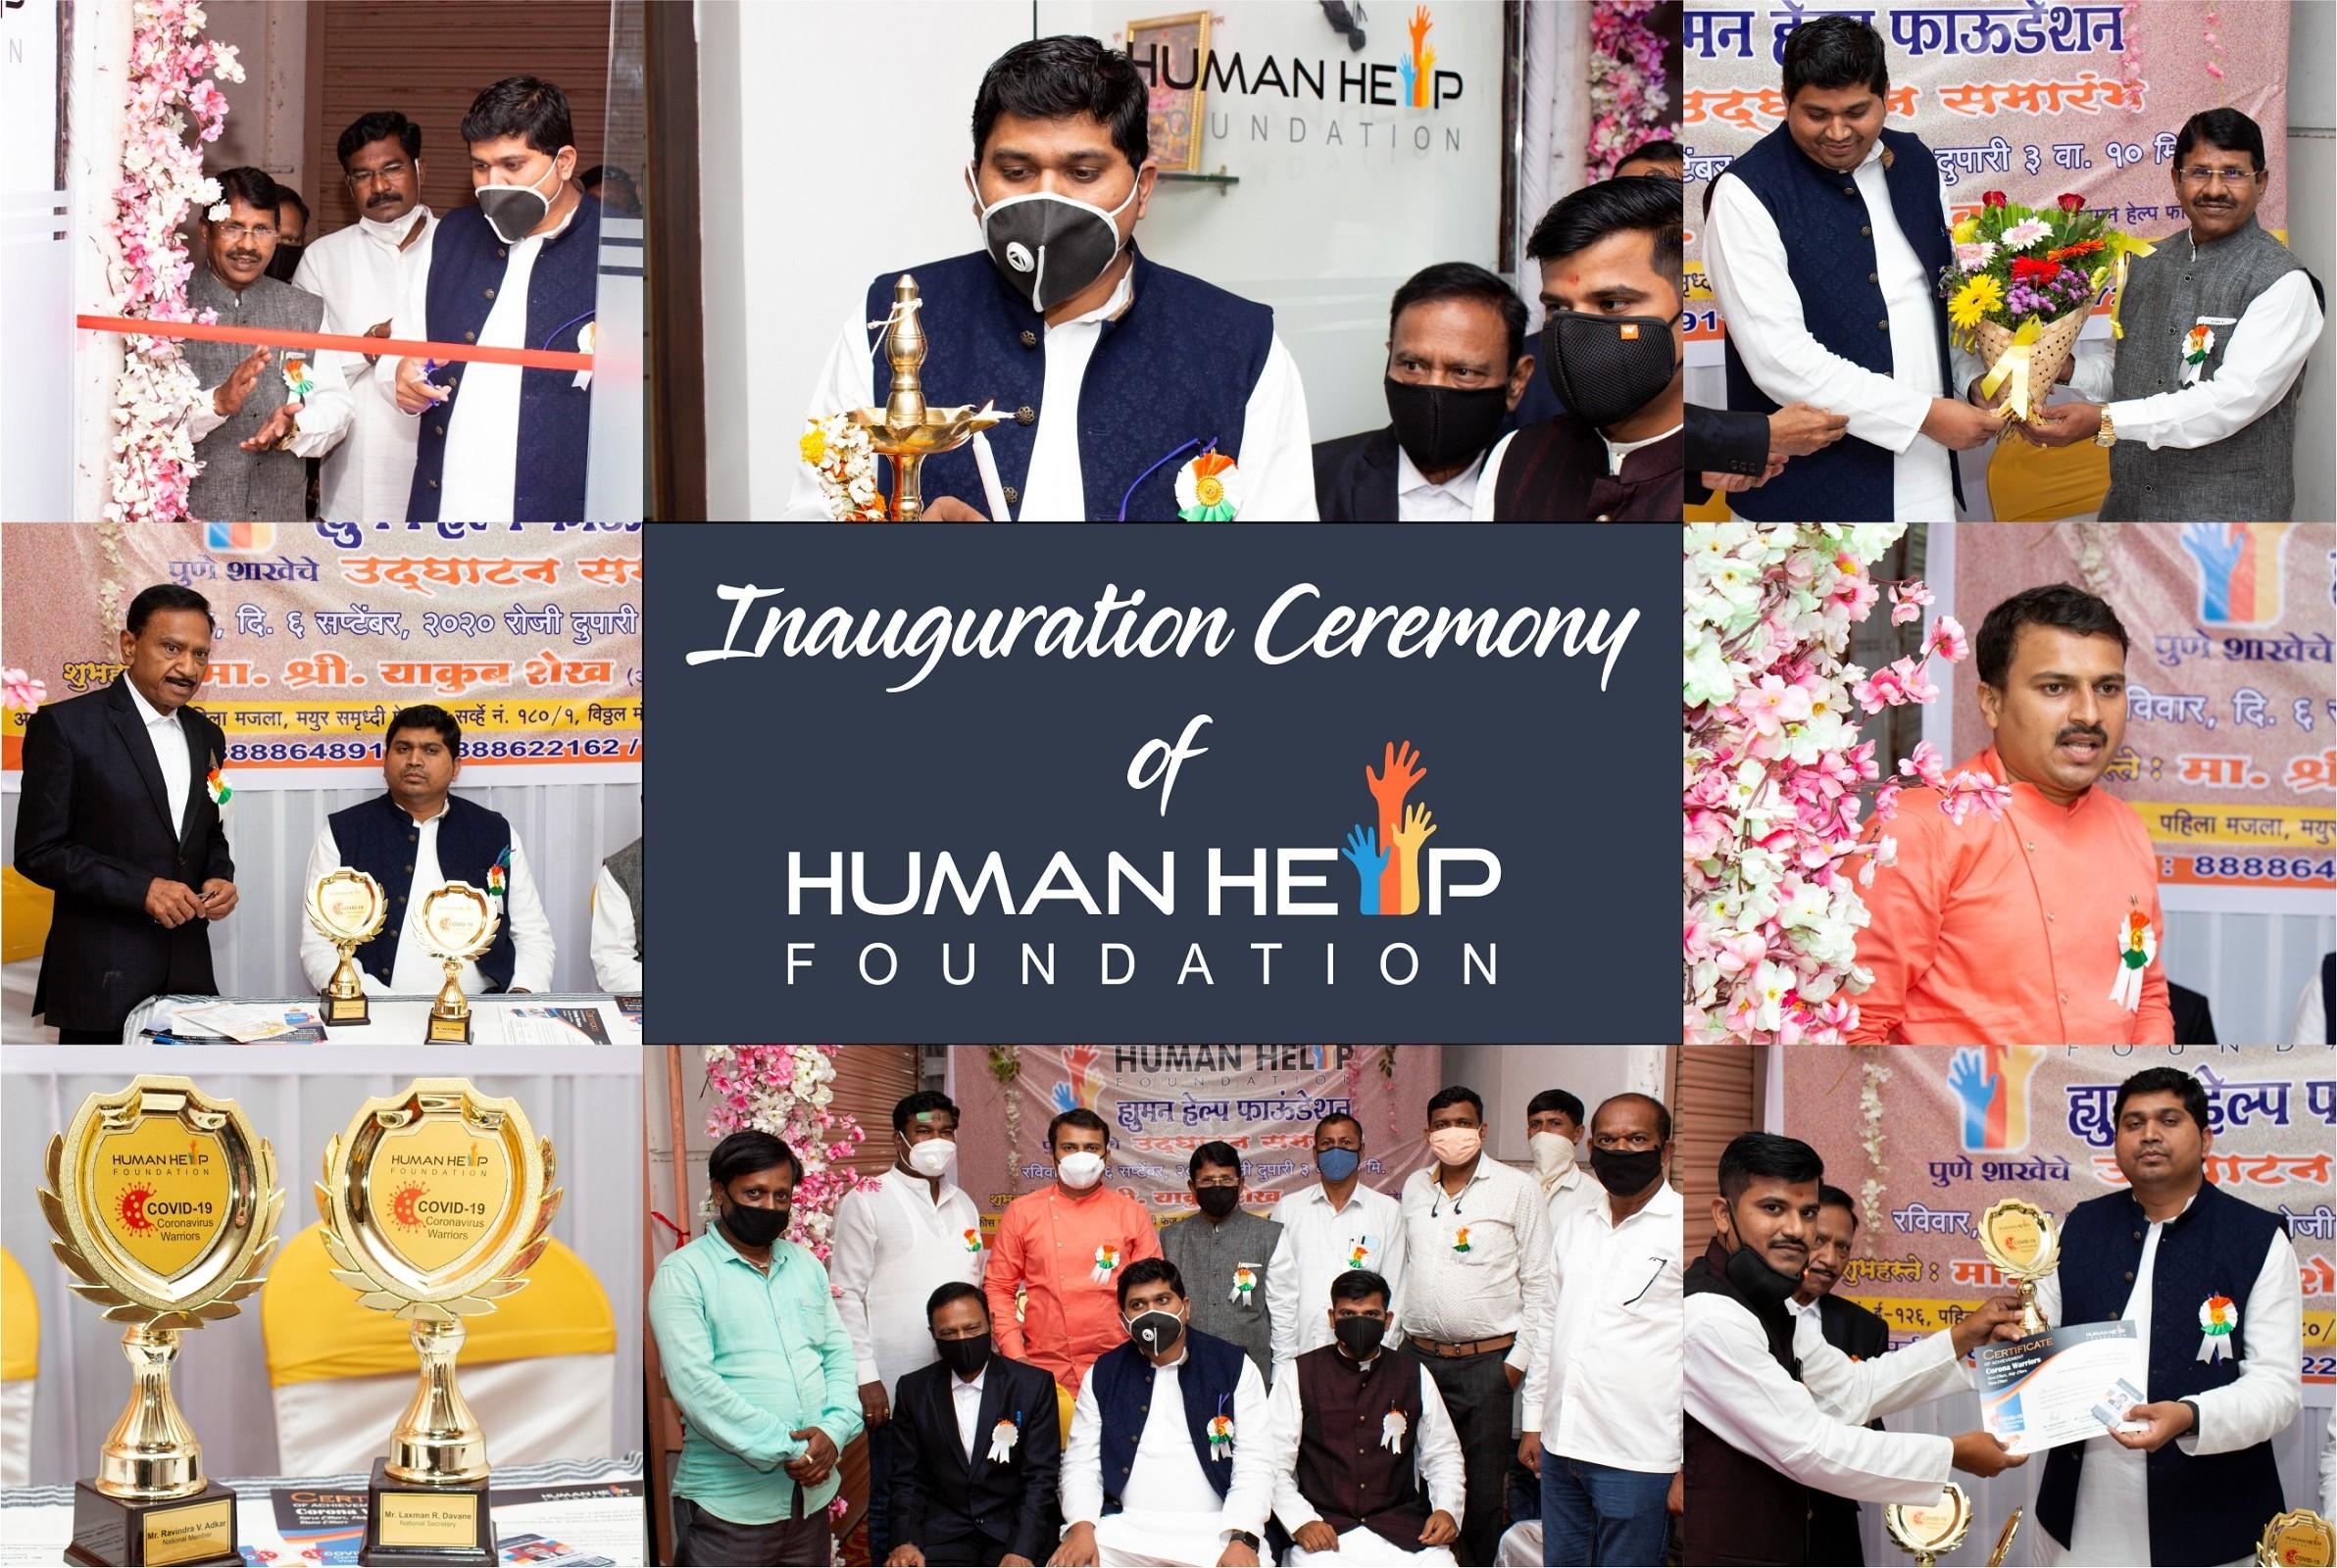 Human Help Foundation Inauguration